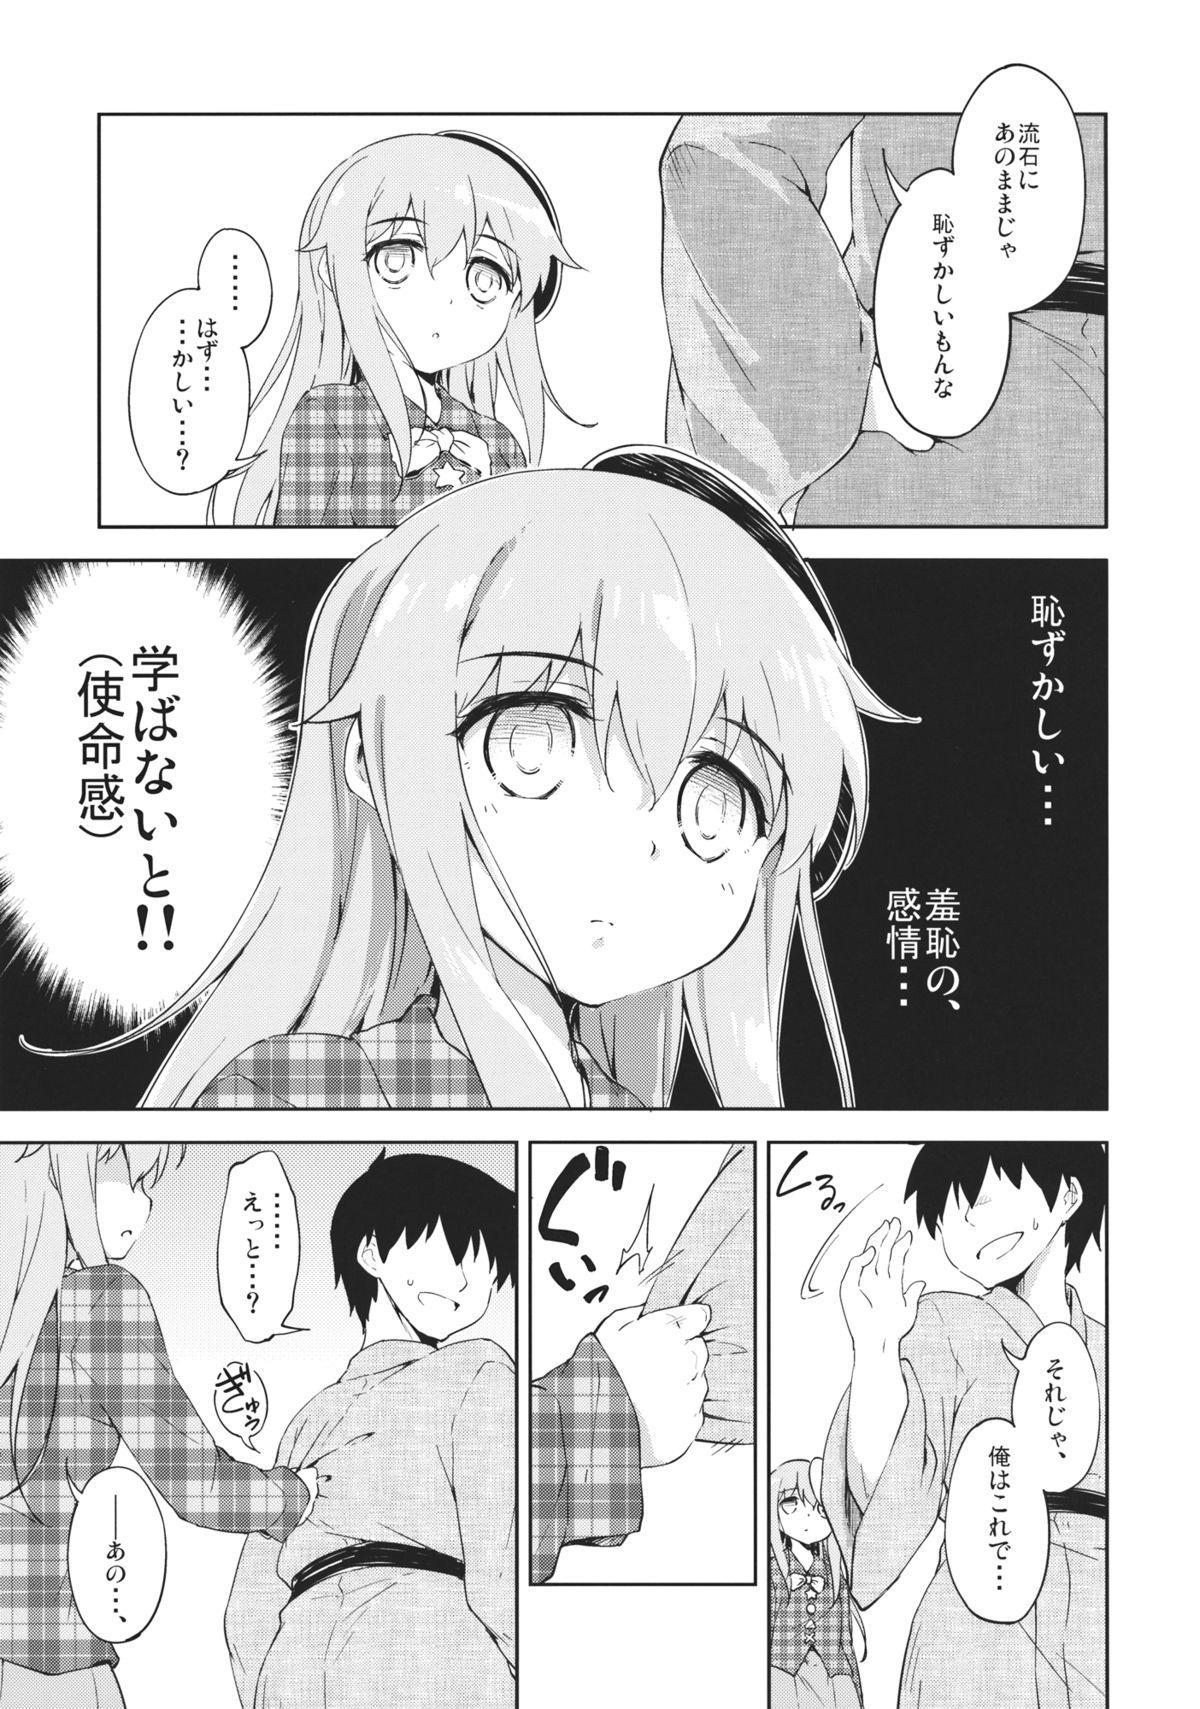 Kokoro, Sarakedashite 5